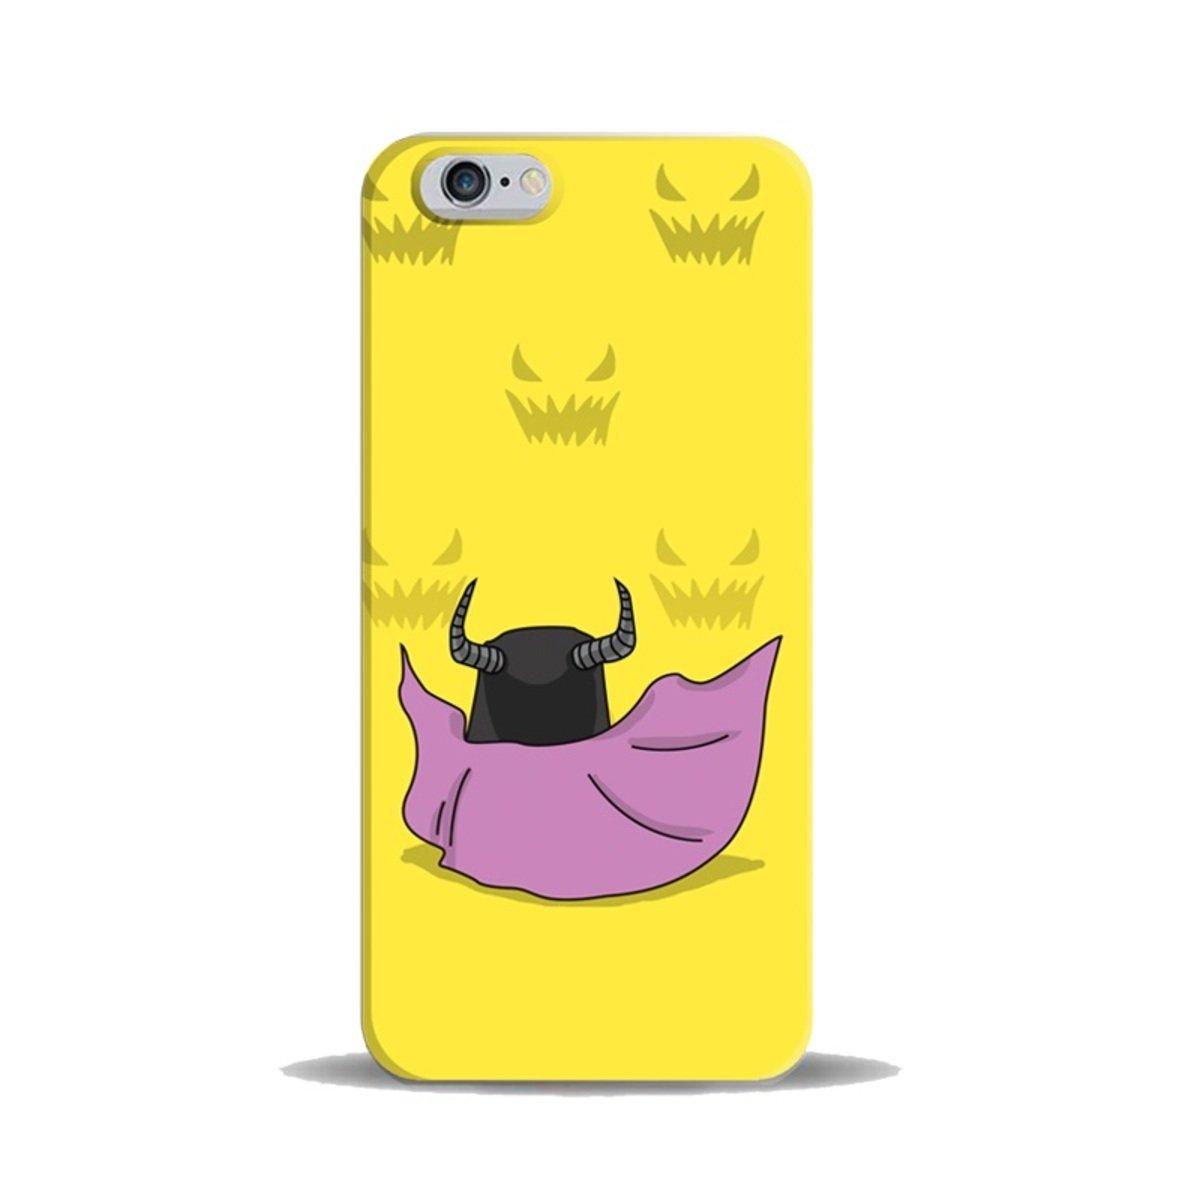 "iPhase - iPhone 6 (4.7"") 手機膠殼電話保護套 4.7寸 (Mo Wong) (另有適合iPhone 6 Plus 5.5寸型號)"